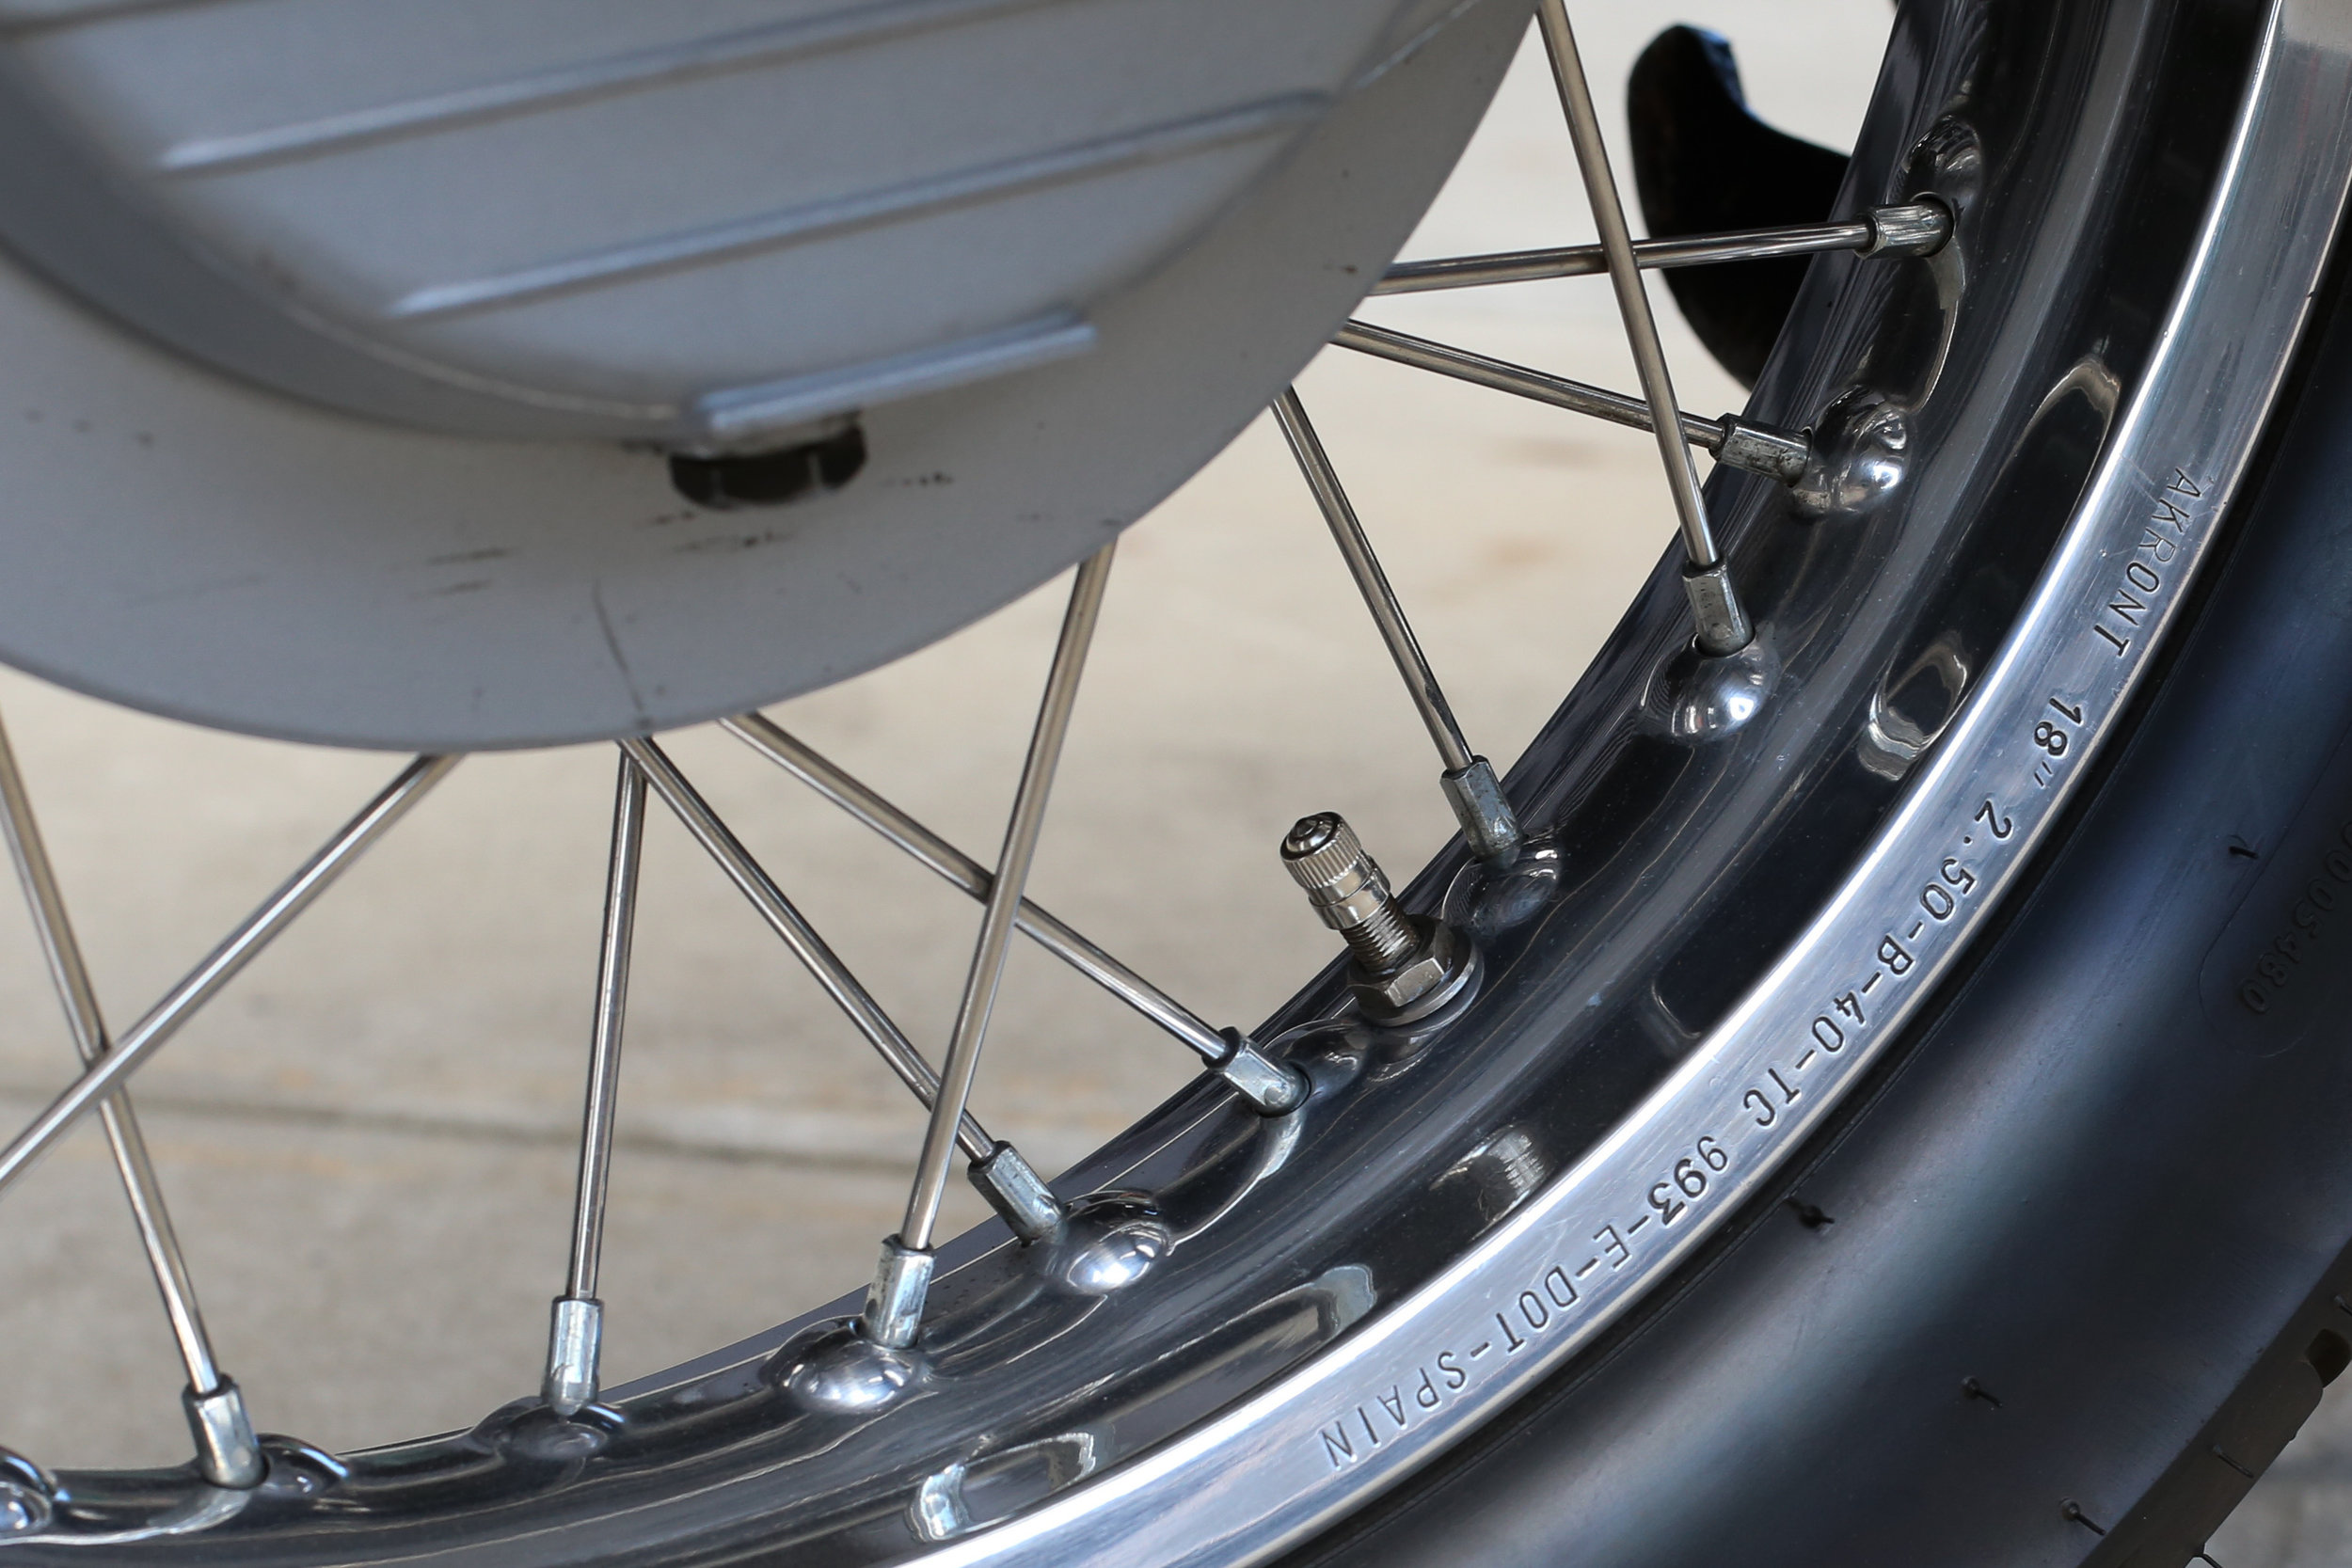 1991 Moto Guzzi 1000S Wheel Serial